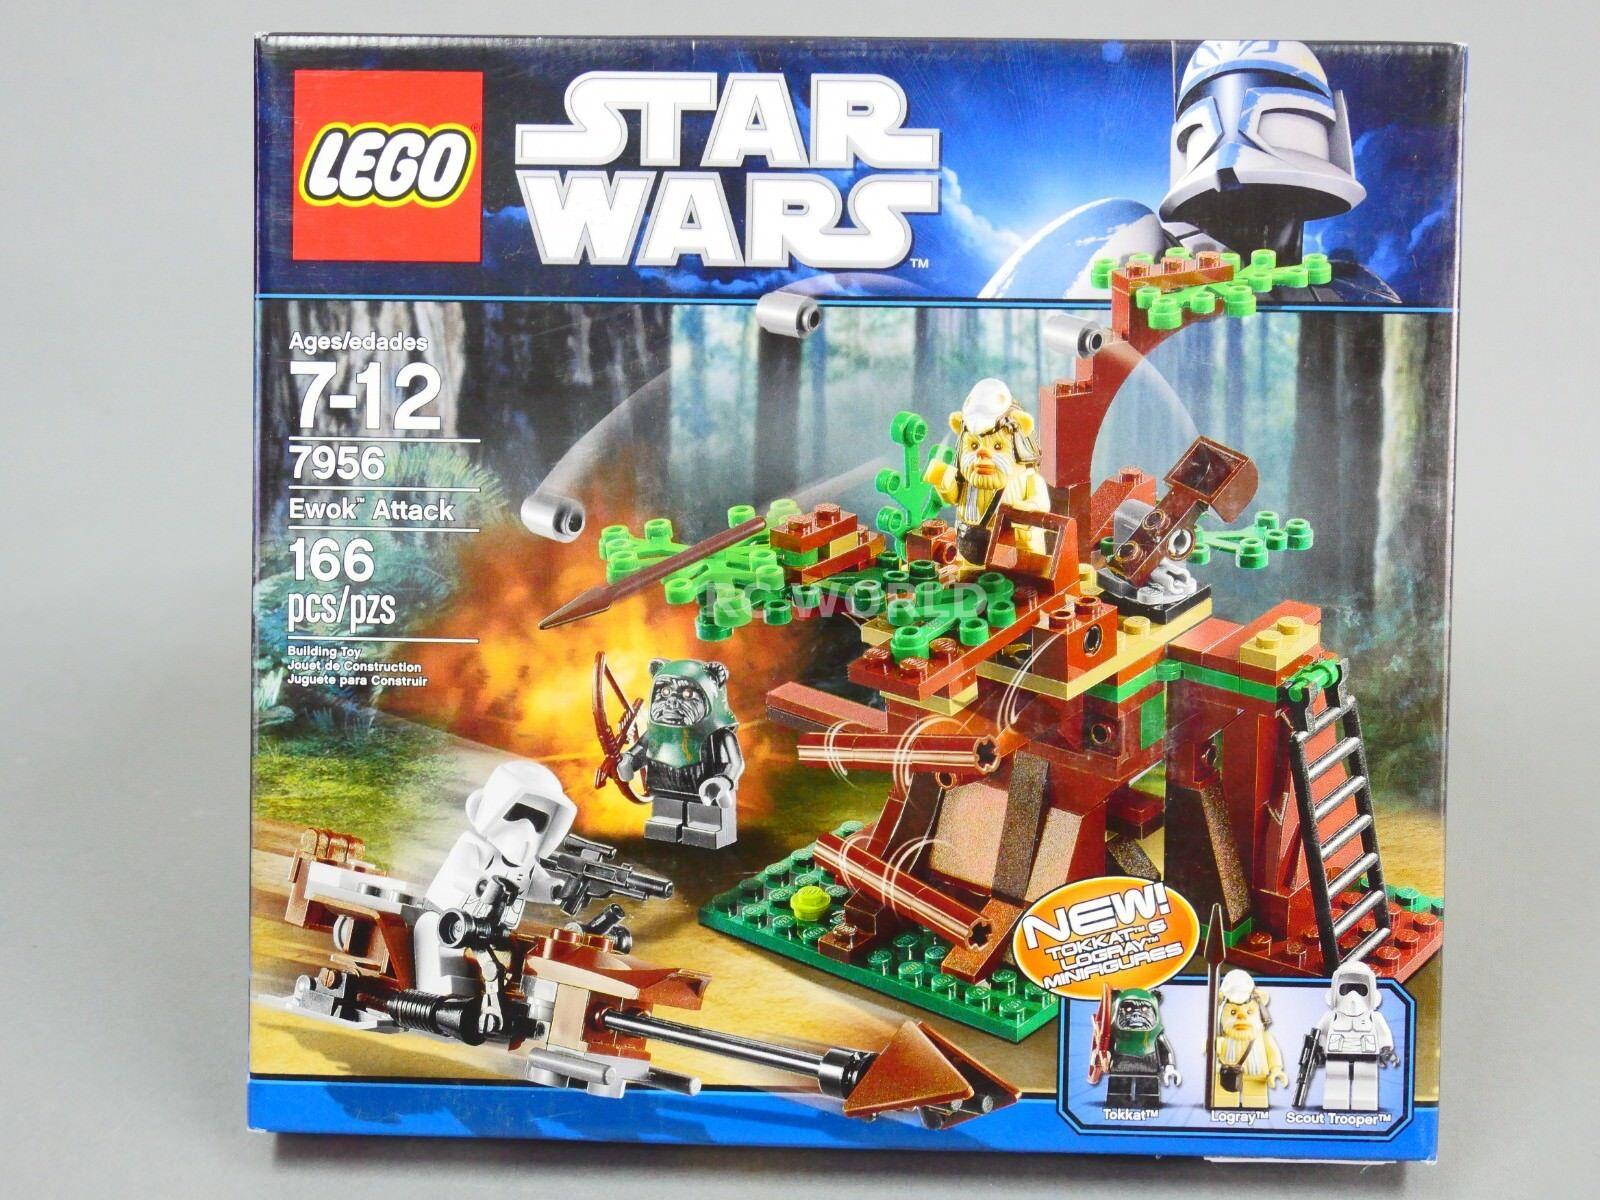 Lego Star Wars Ewok Angriff 7956  oa1